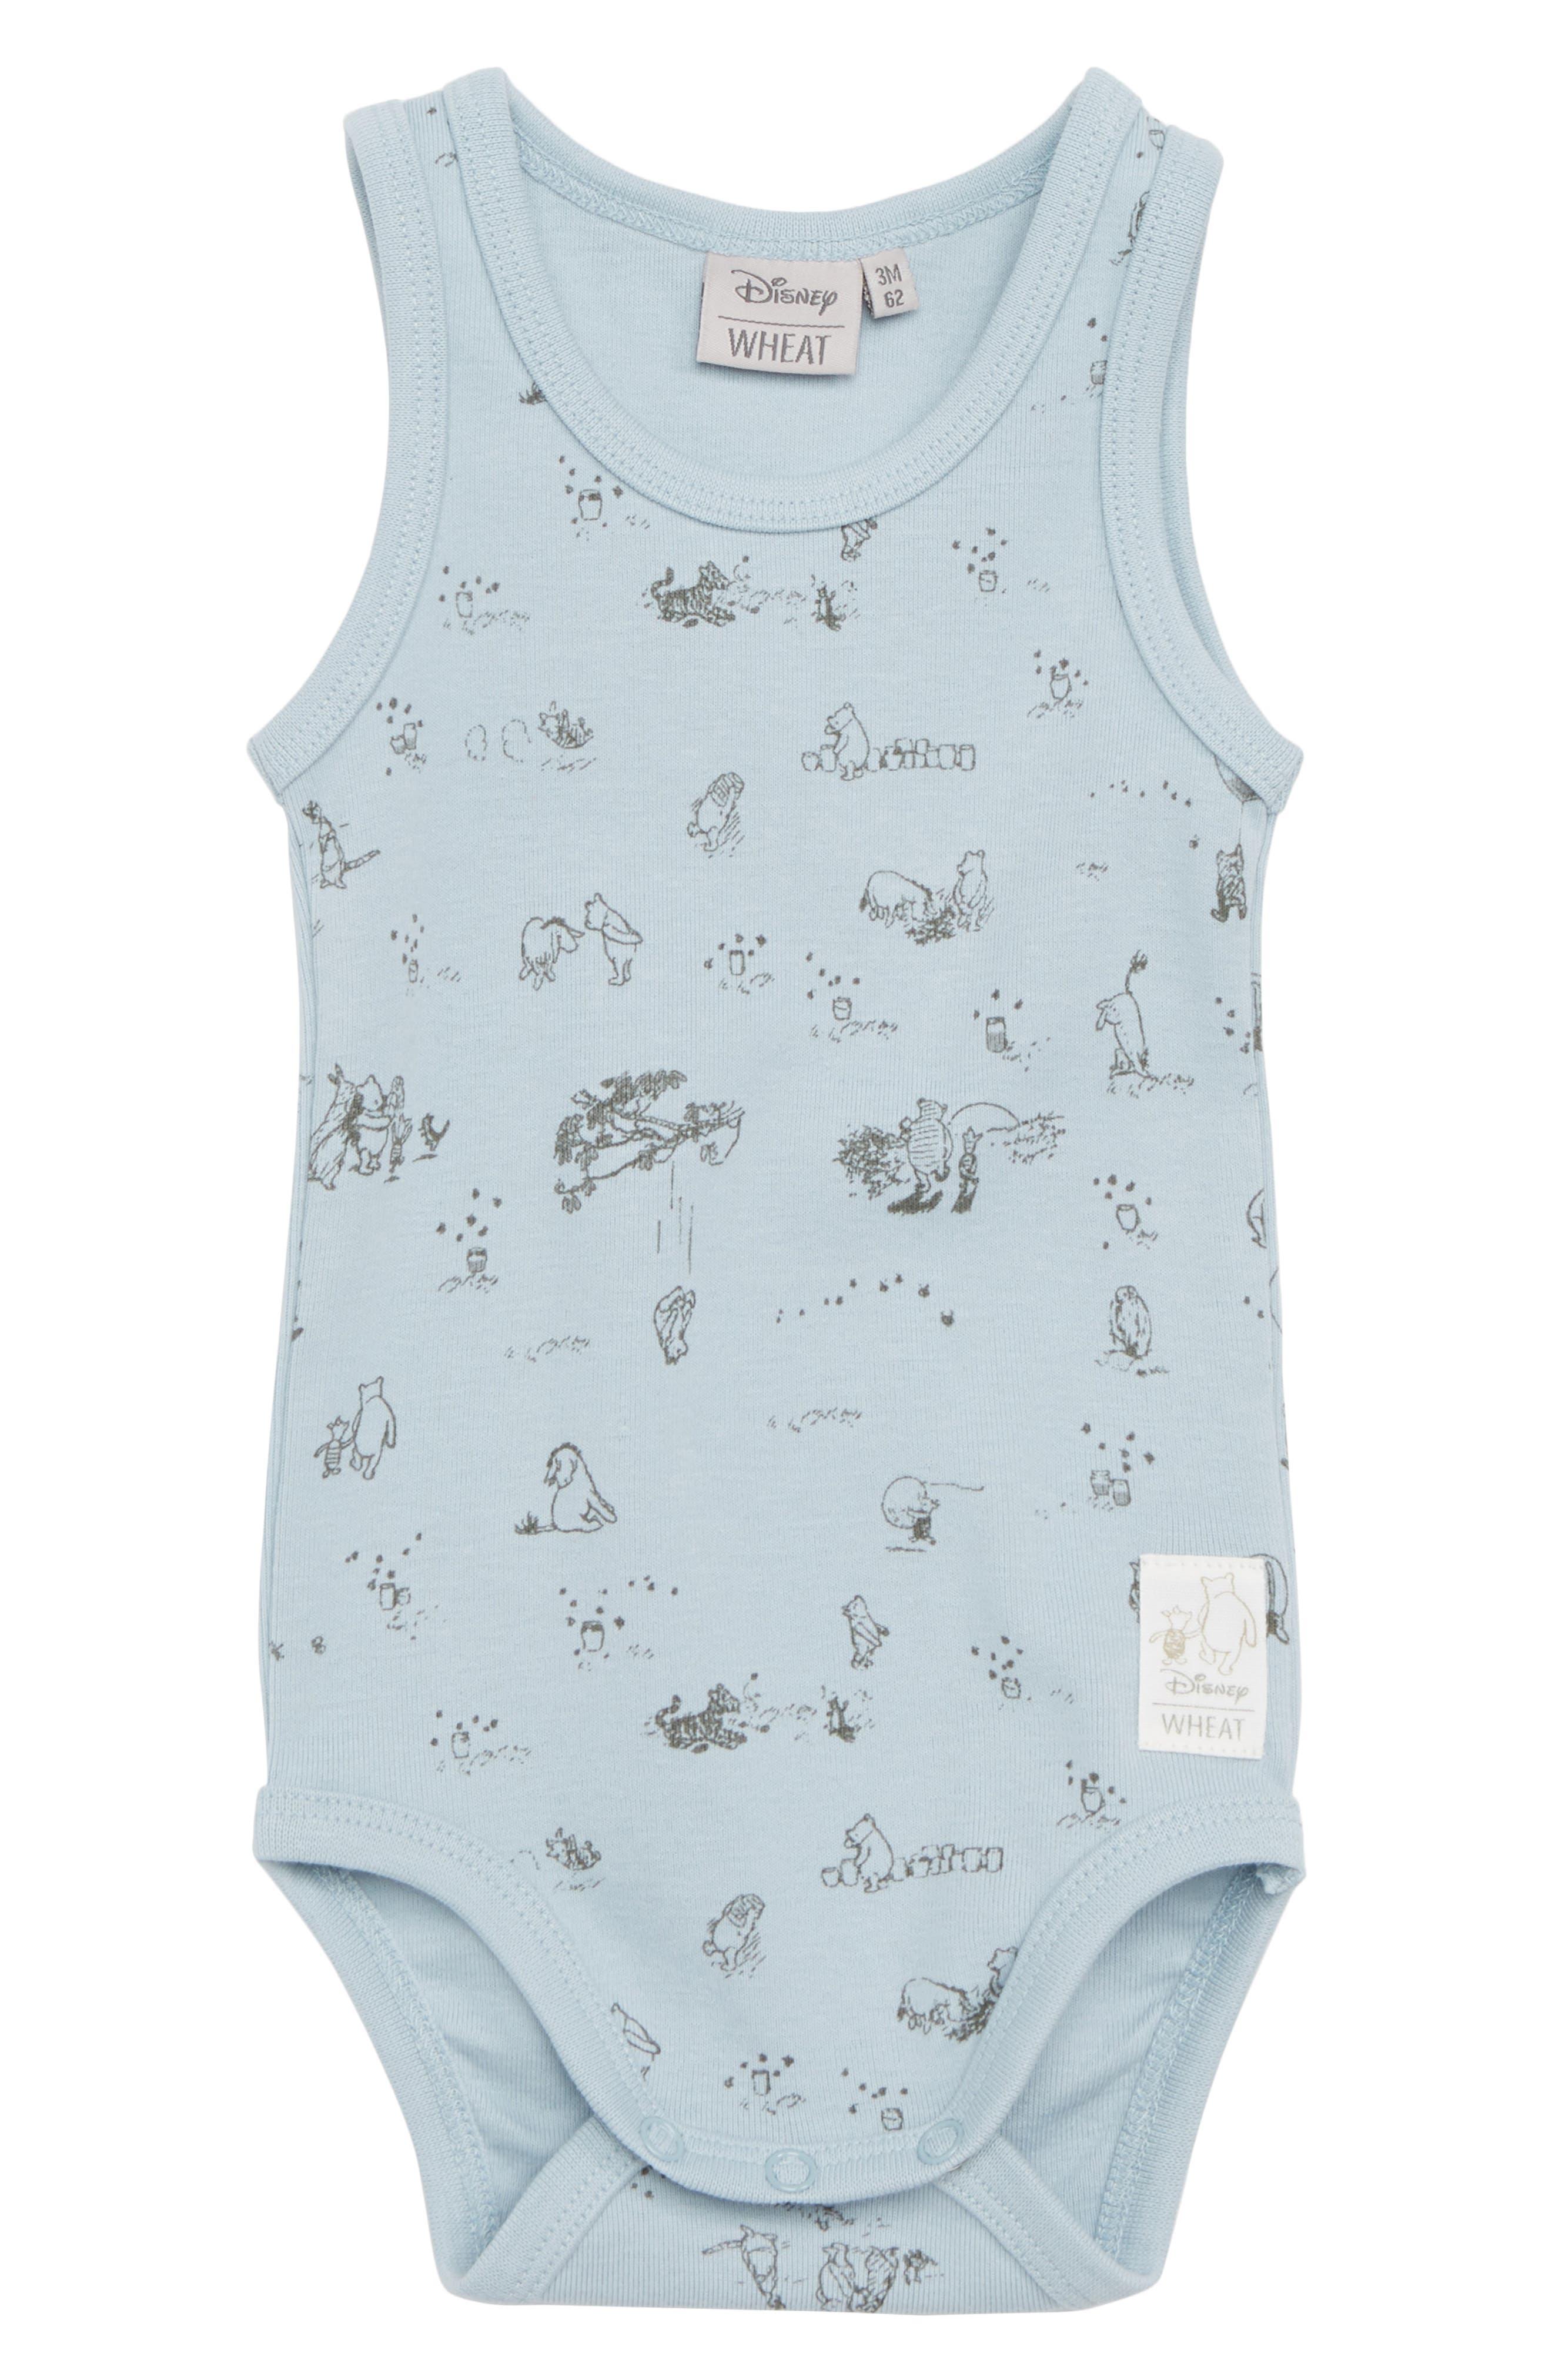 x Disney<sup>®</sup> Winnie the Pooh Organic Cotton Bodysuit,                         Main,                         color, 402